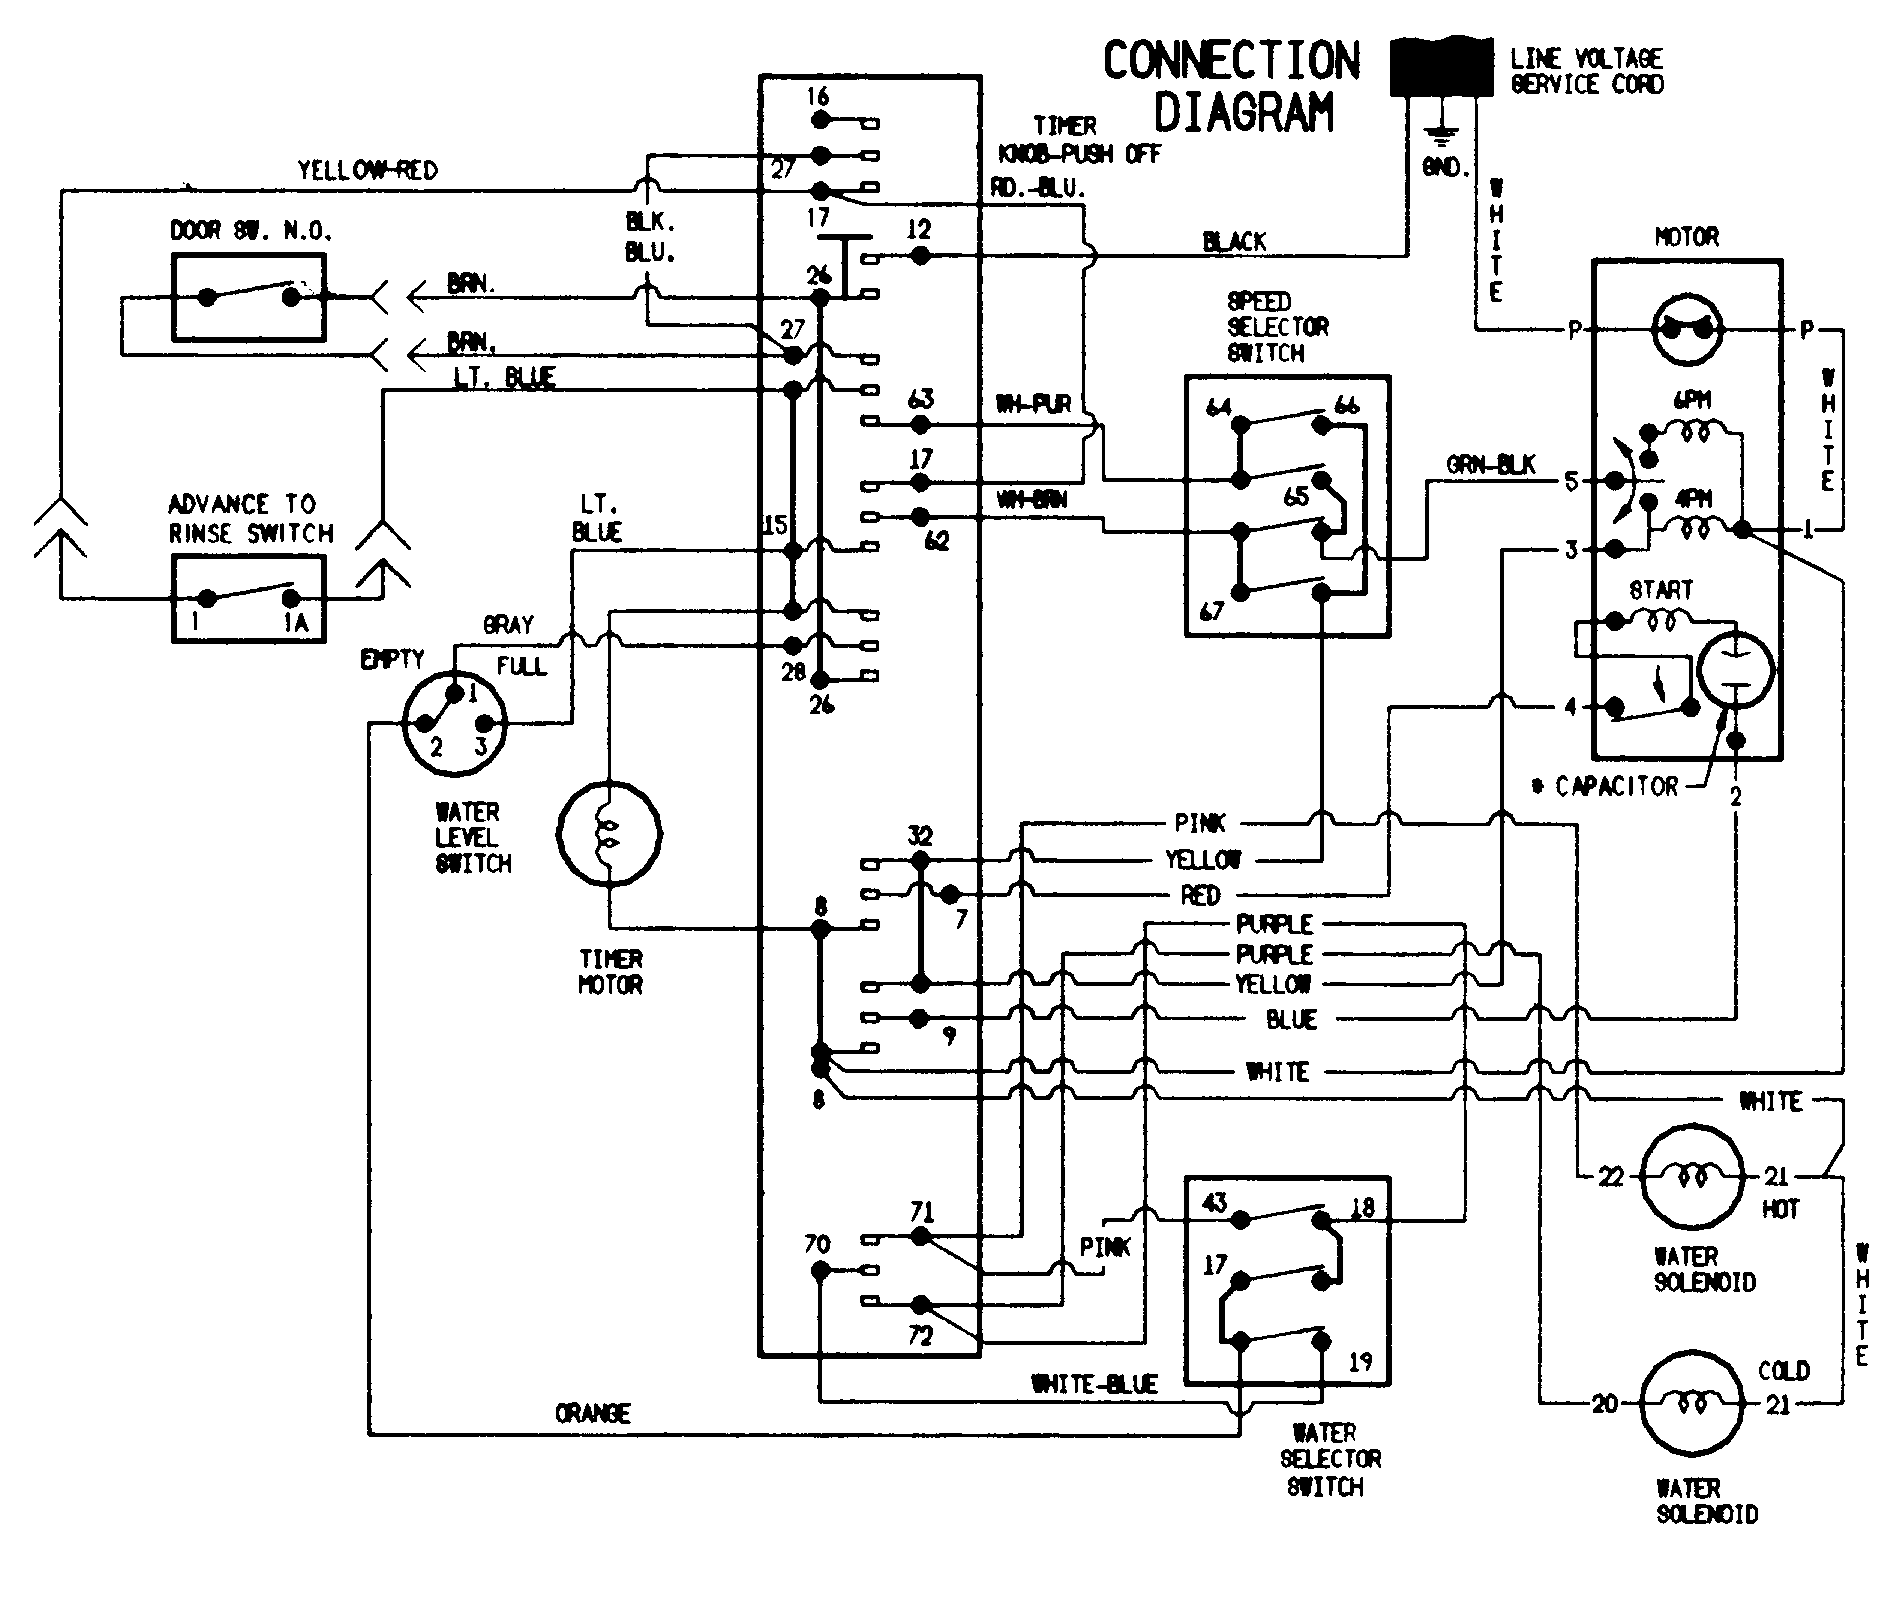 Whirlpool Duet Dryer Wiring Schematic Diagrams